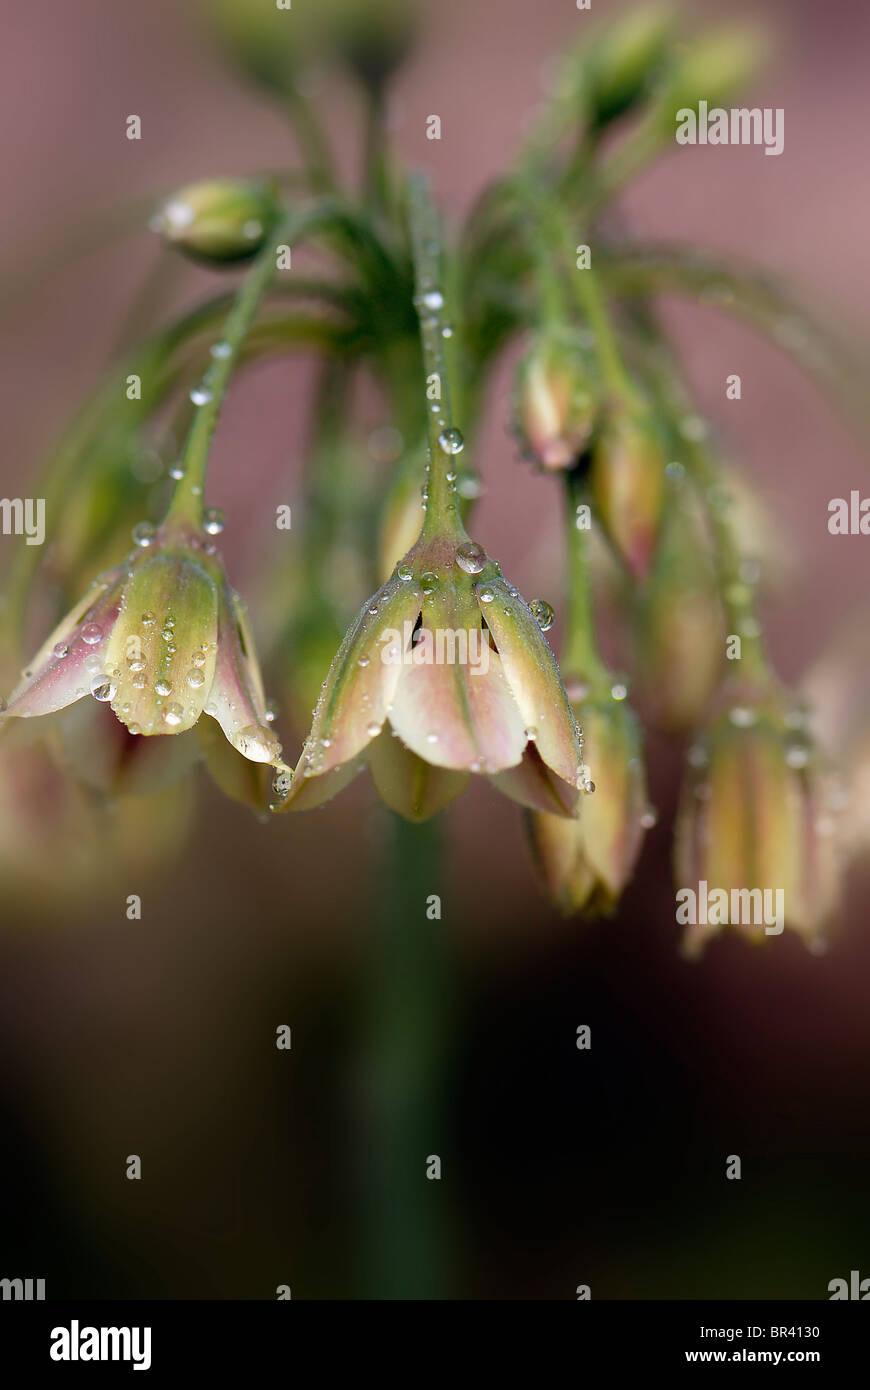 Sicilian Honey Garlic Flower - Nectaroscordum siculum - Stock Image